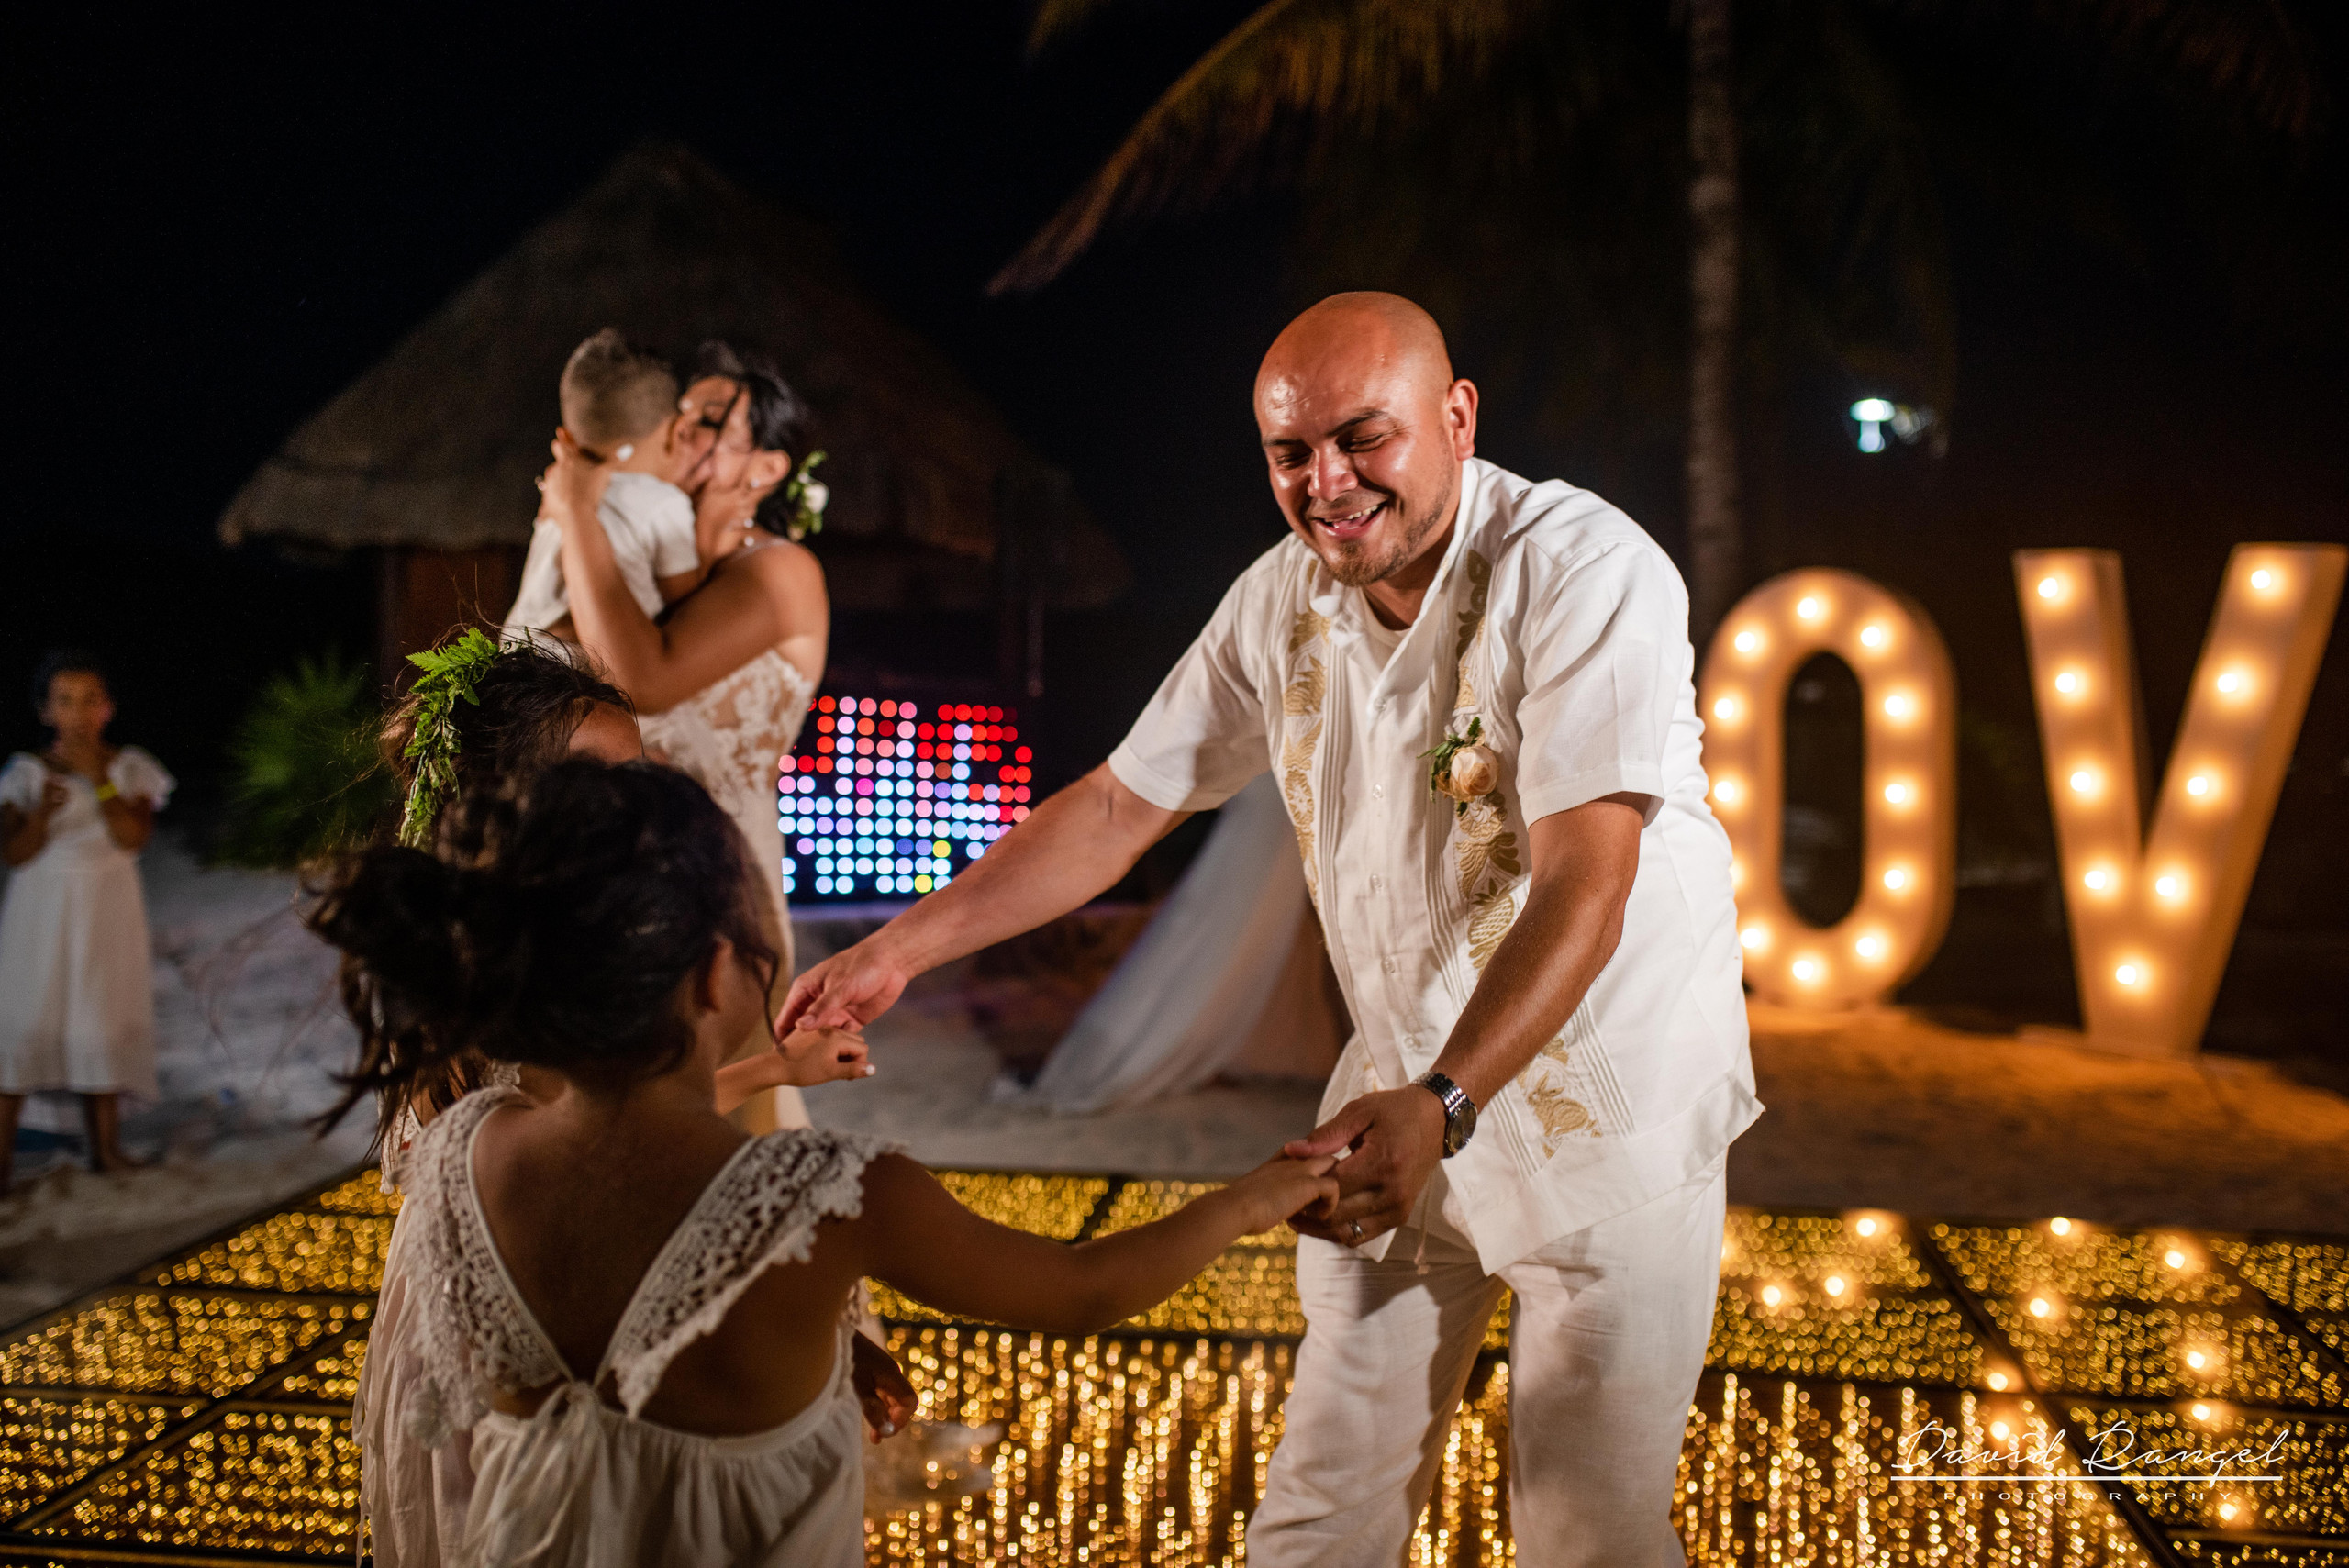 first+dance+occidental+xcaret+venue+dance+floor+bride+groom+love+letters+kids+son+daugthers